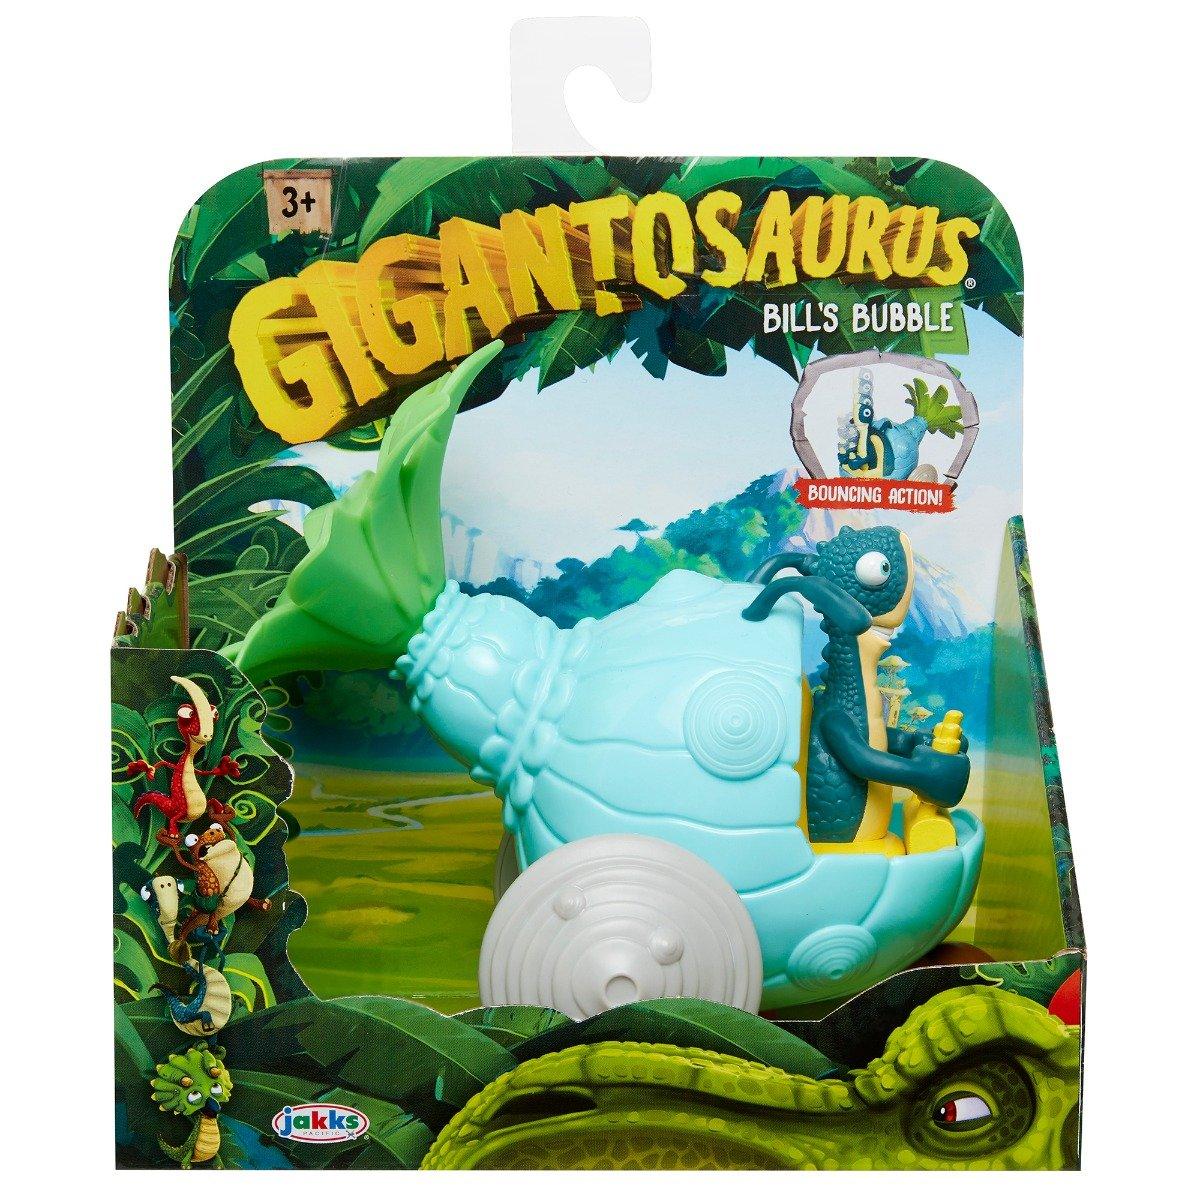 Figurina cu autovehicul Gigantosaurus, Bill's Bubble